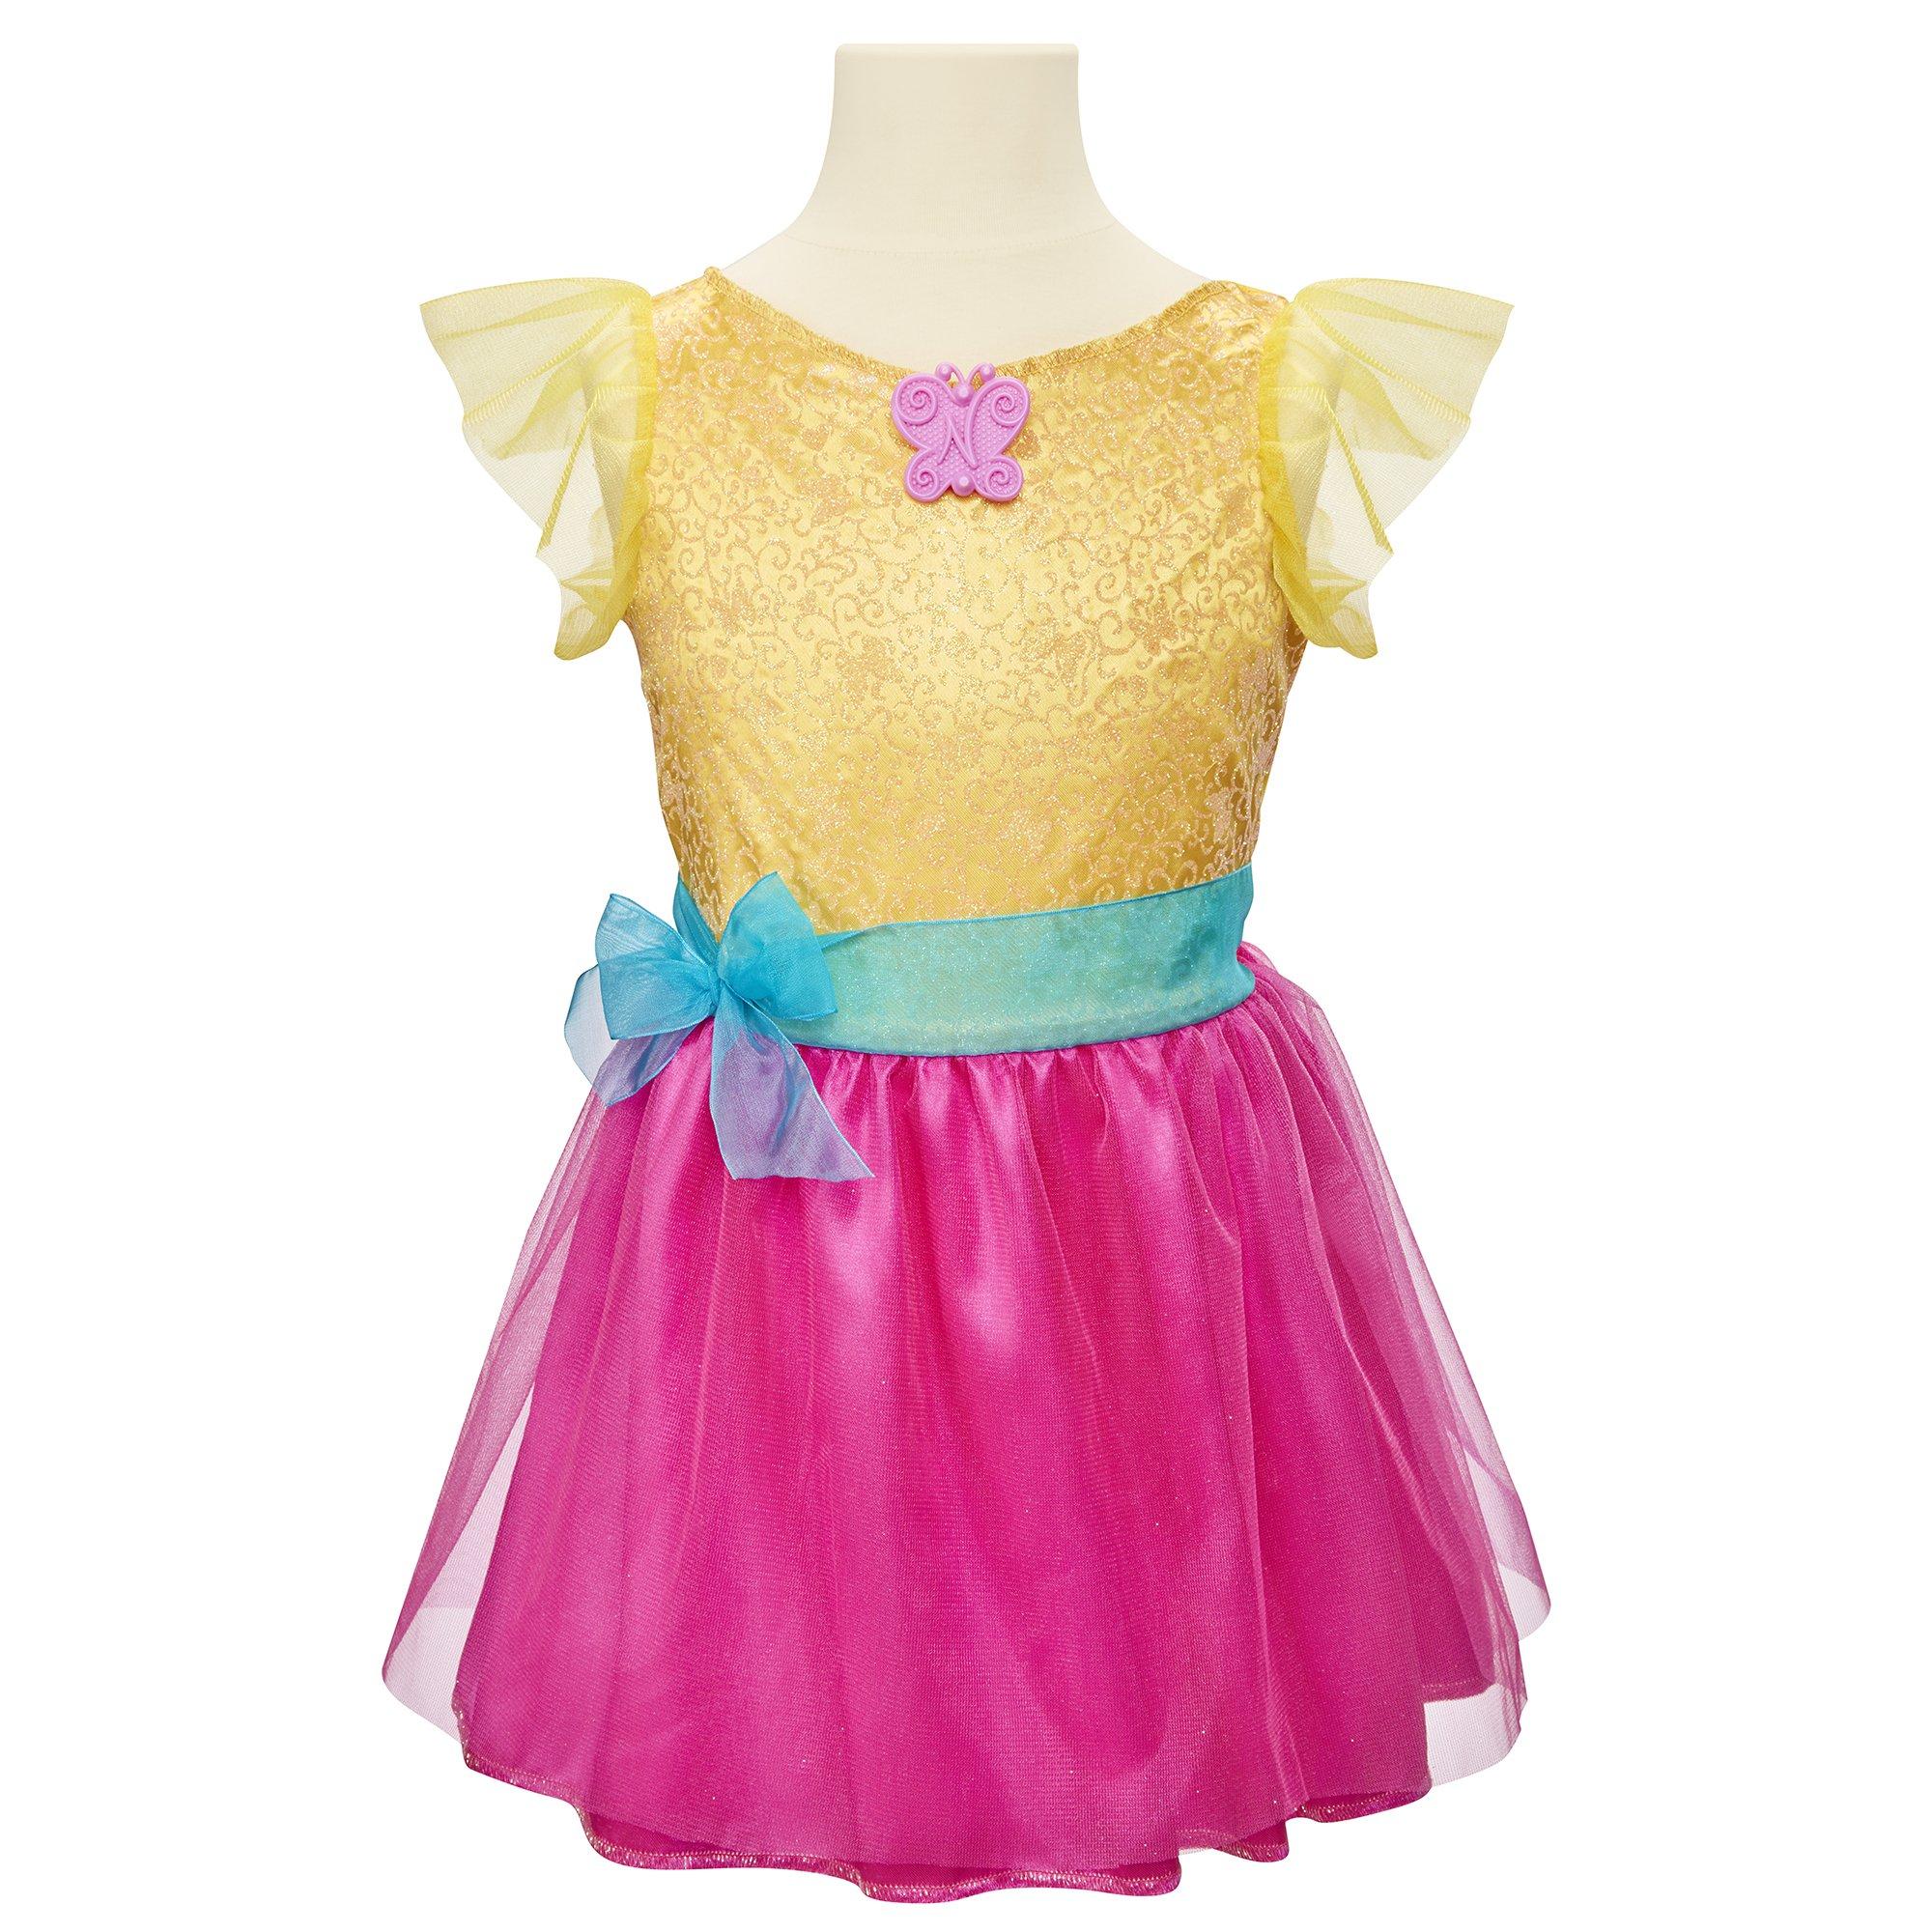 Fancy Nancy Ultimate Dress-Up Trunk, 13-Pieces, Fits Sizes 4-6X [Amazon Exclusive] by Fancy Nancy (Image #10)